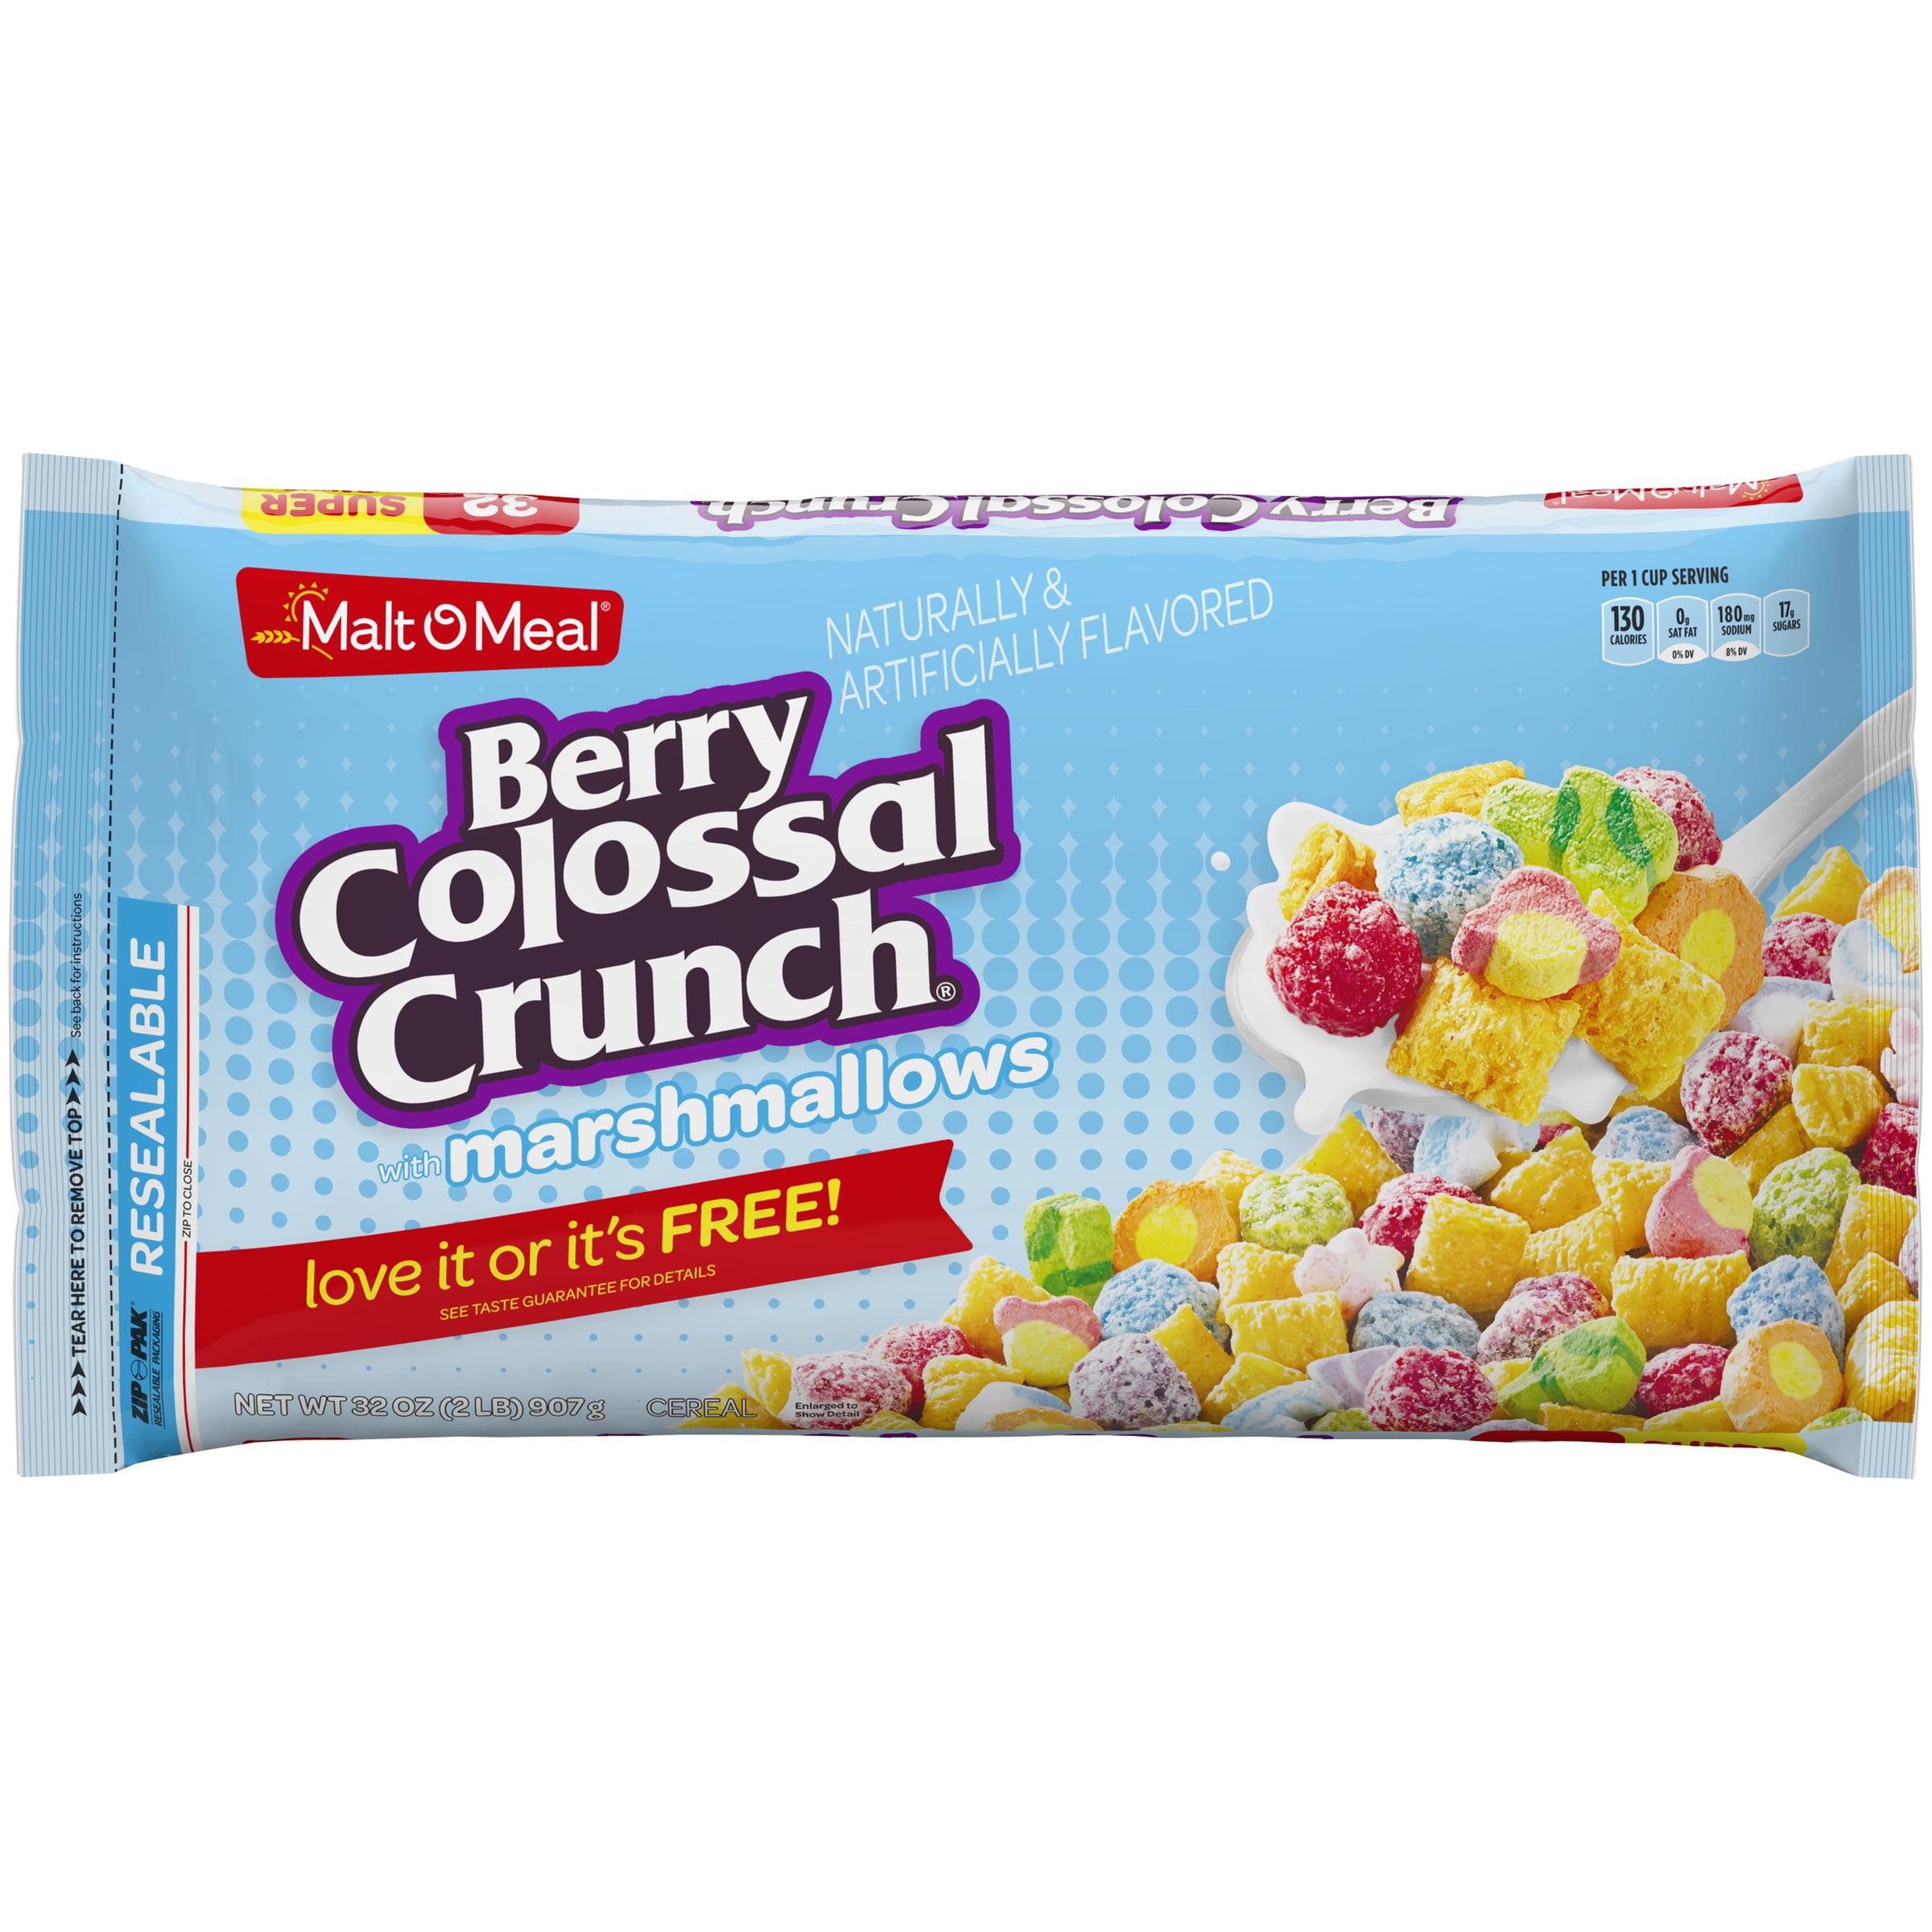 Malt-O-Meal Cereal, Berry Colossal Crunch, Marshmallows, 32 Oz, Bag